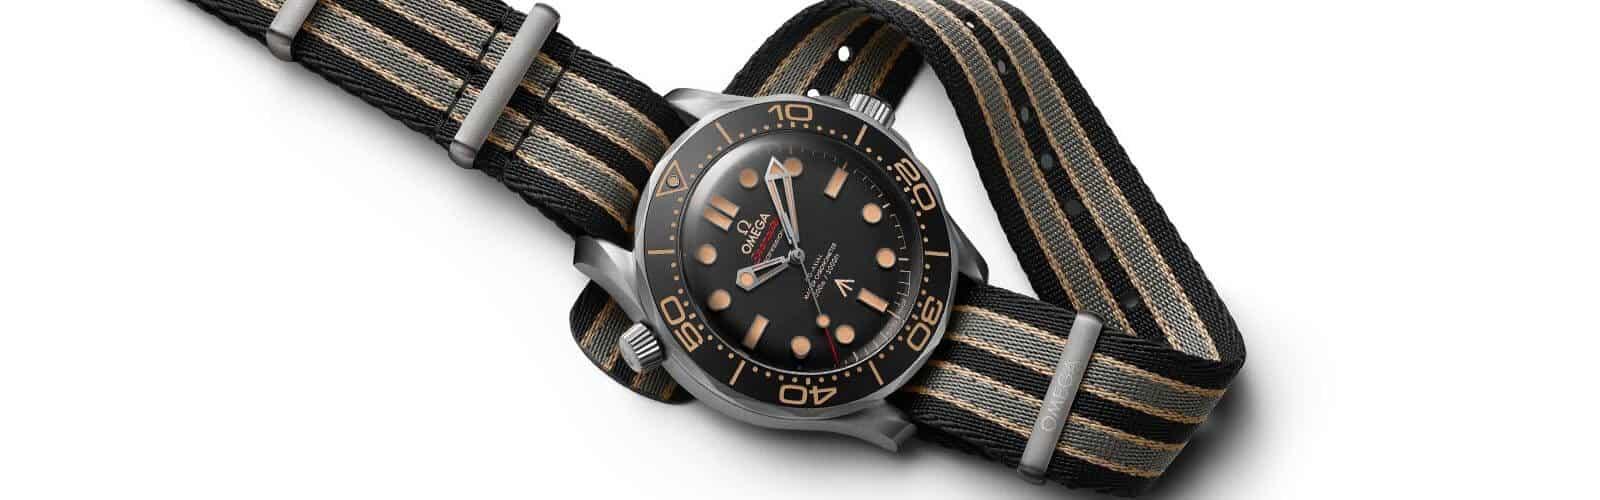 Header 3 OMEGA Seamaster Diver 300M 007 Edition